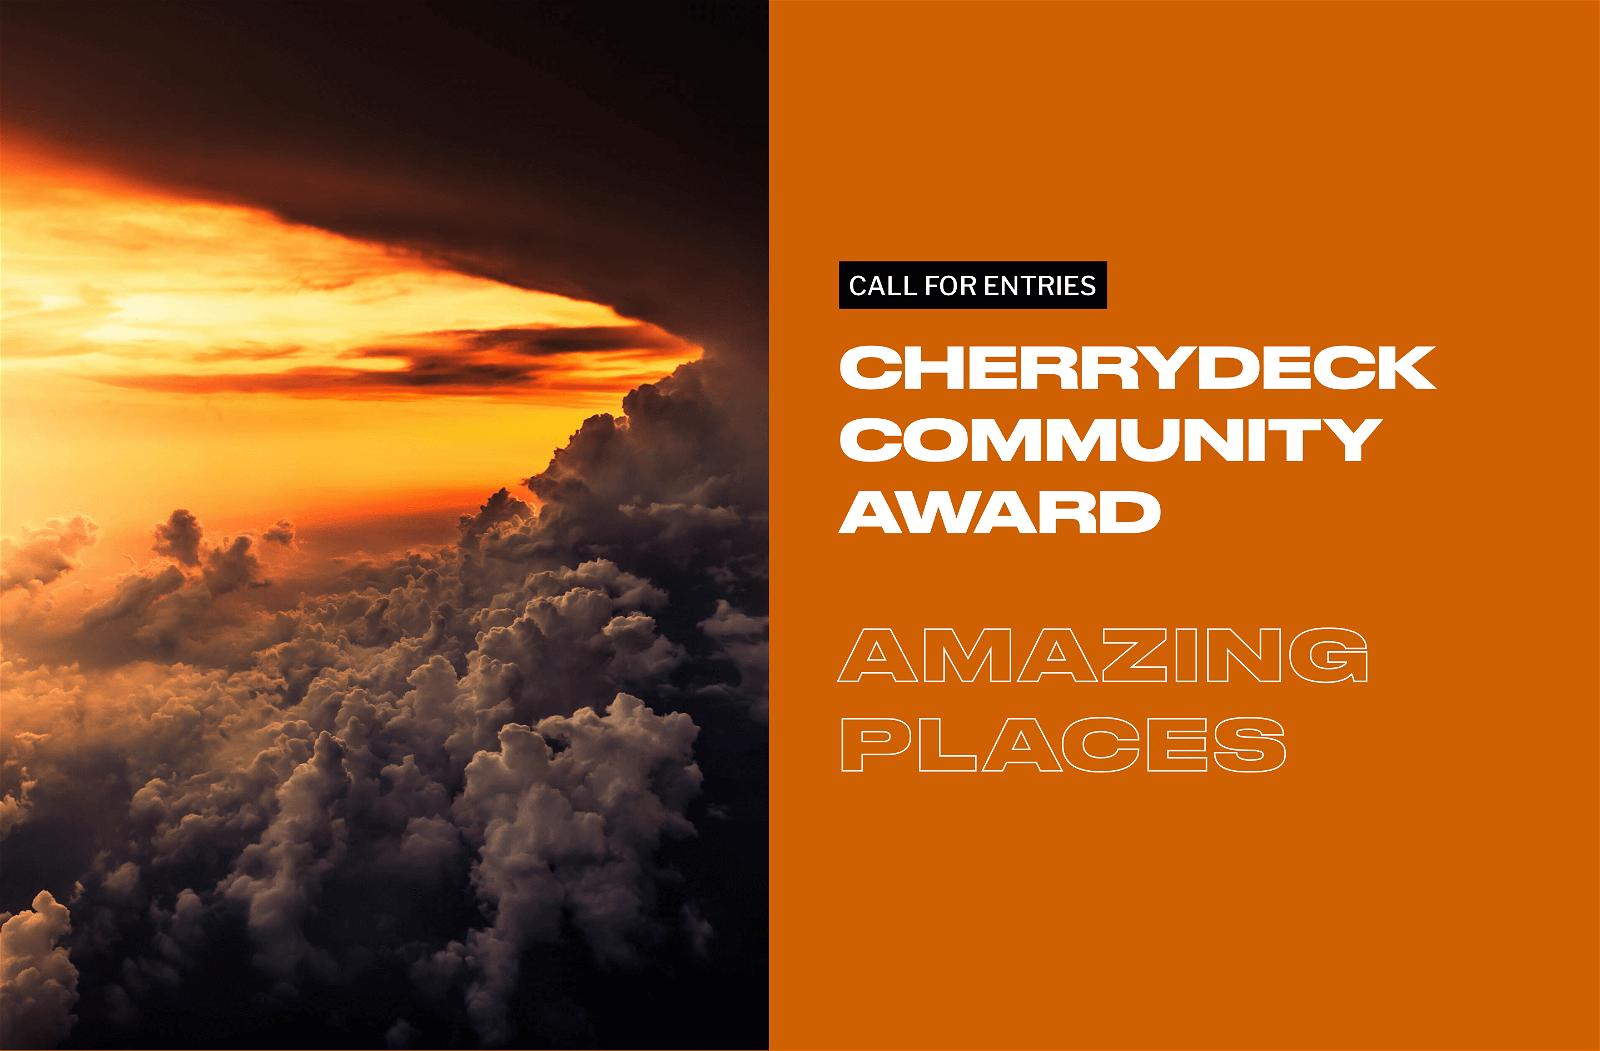 Cherrydeck Community Award Amazing Places